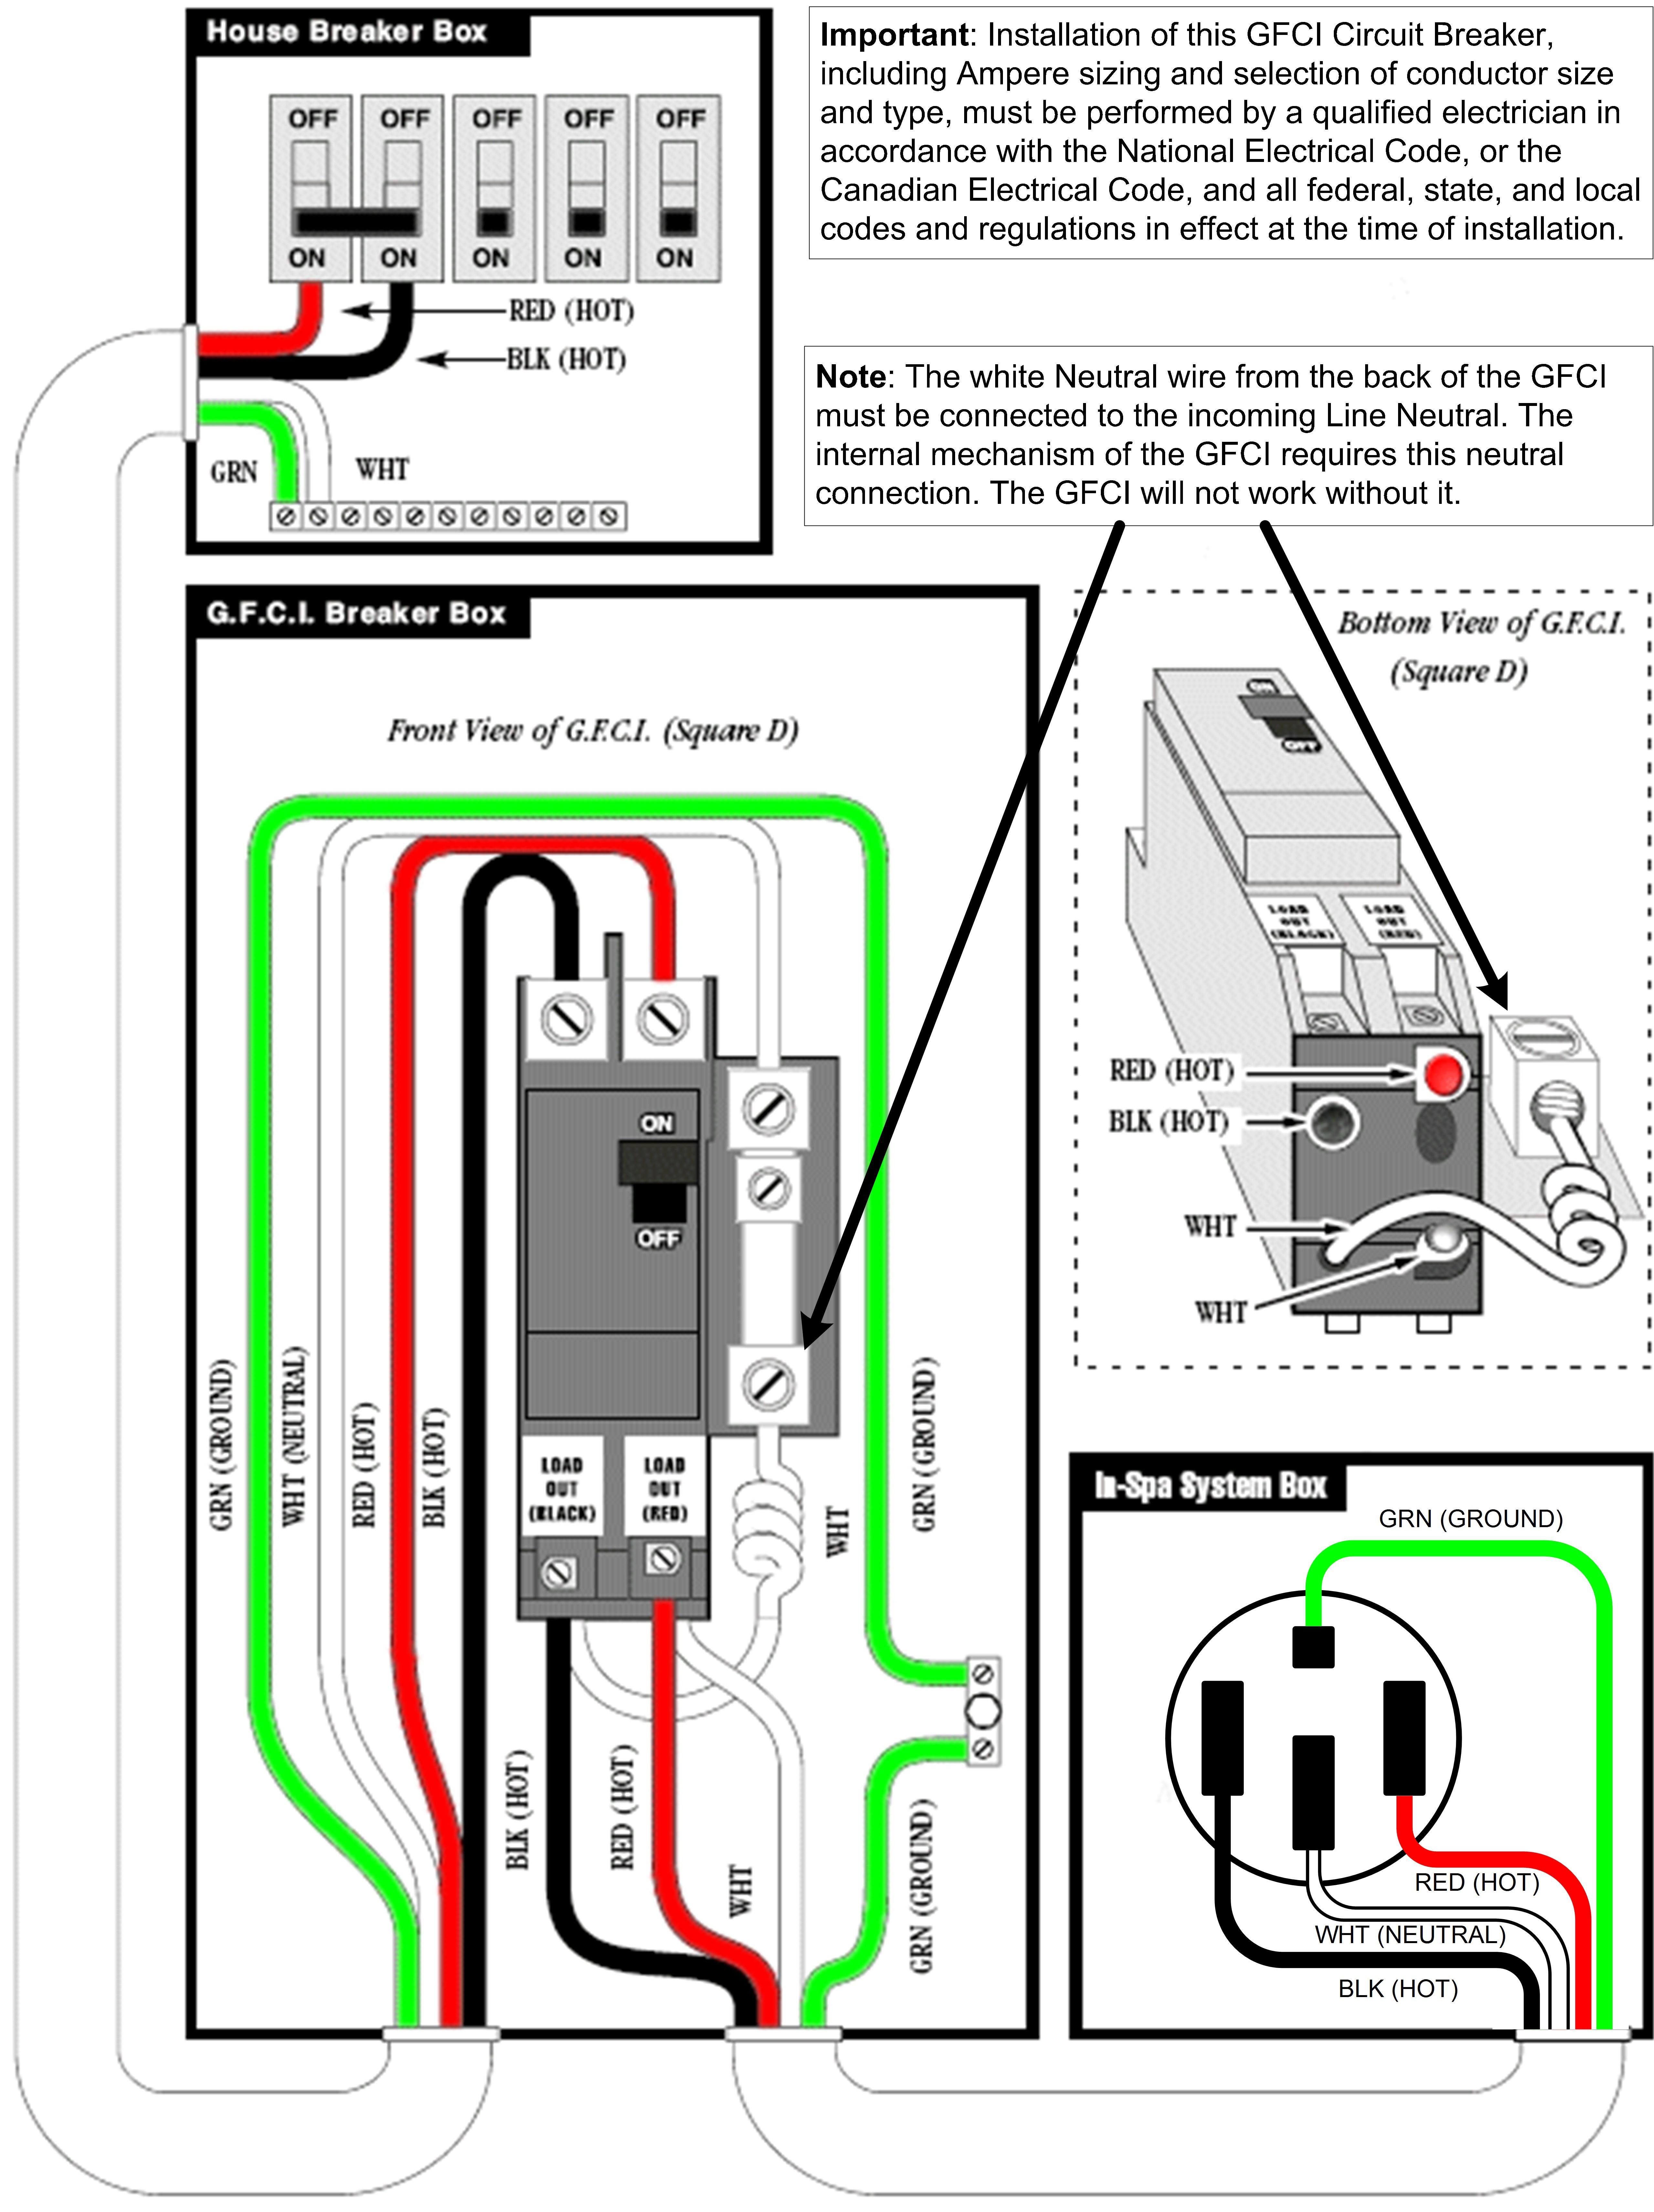 50 amp square d gfci breaker wiring diagram Download-2 Pole Gfci Breaker Wiring Diagram Fresh Gfi Breaker Wiring Wiring Diagram 8-e